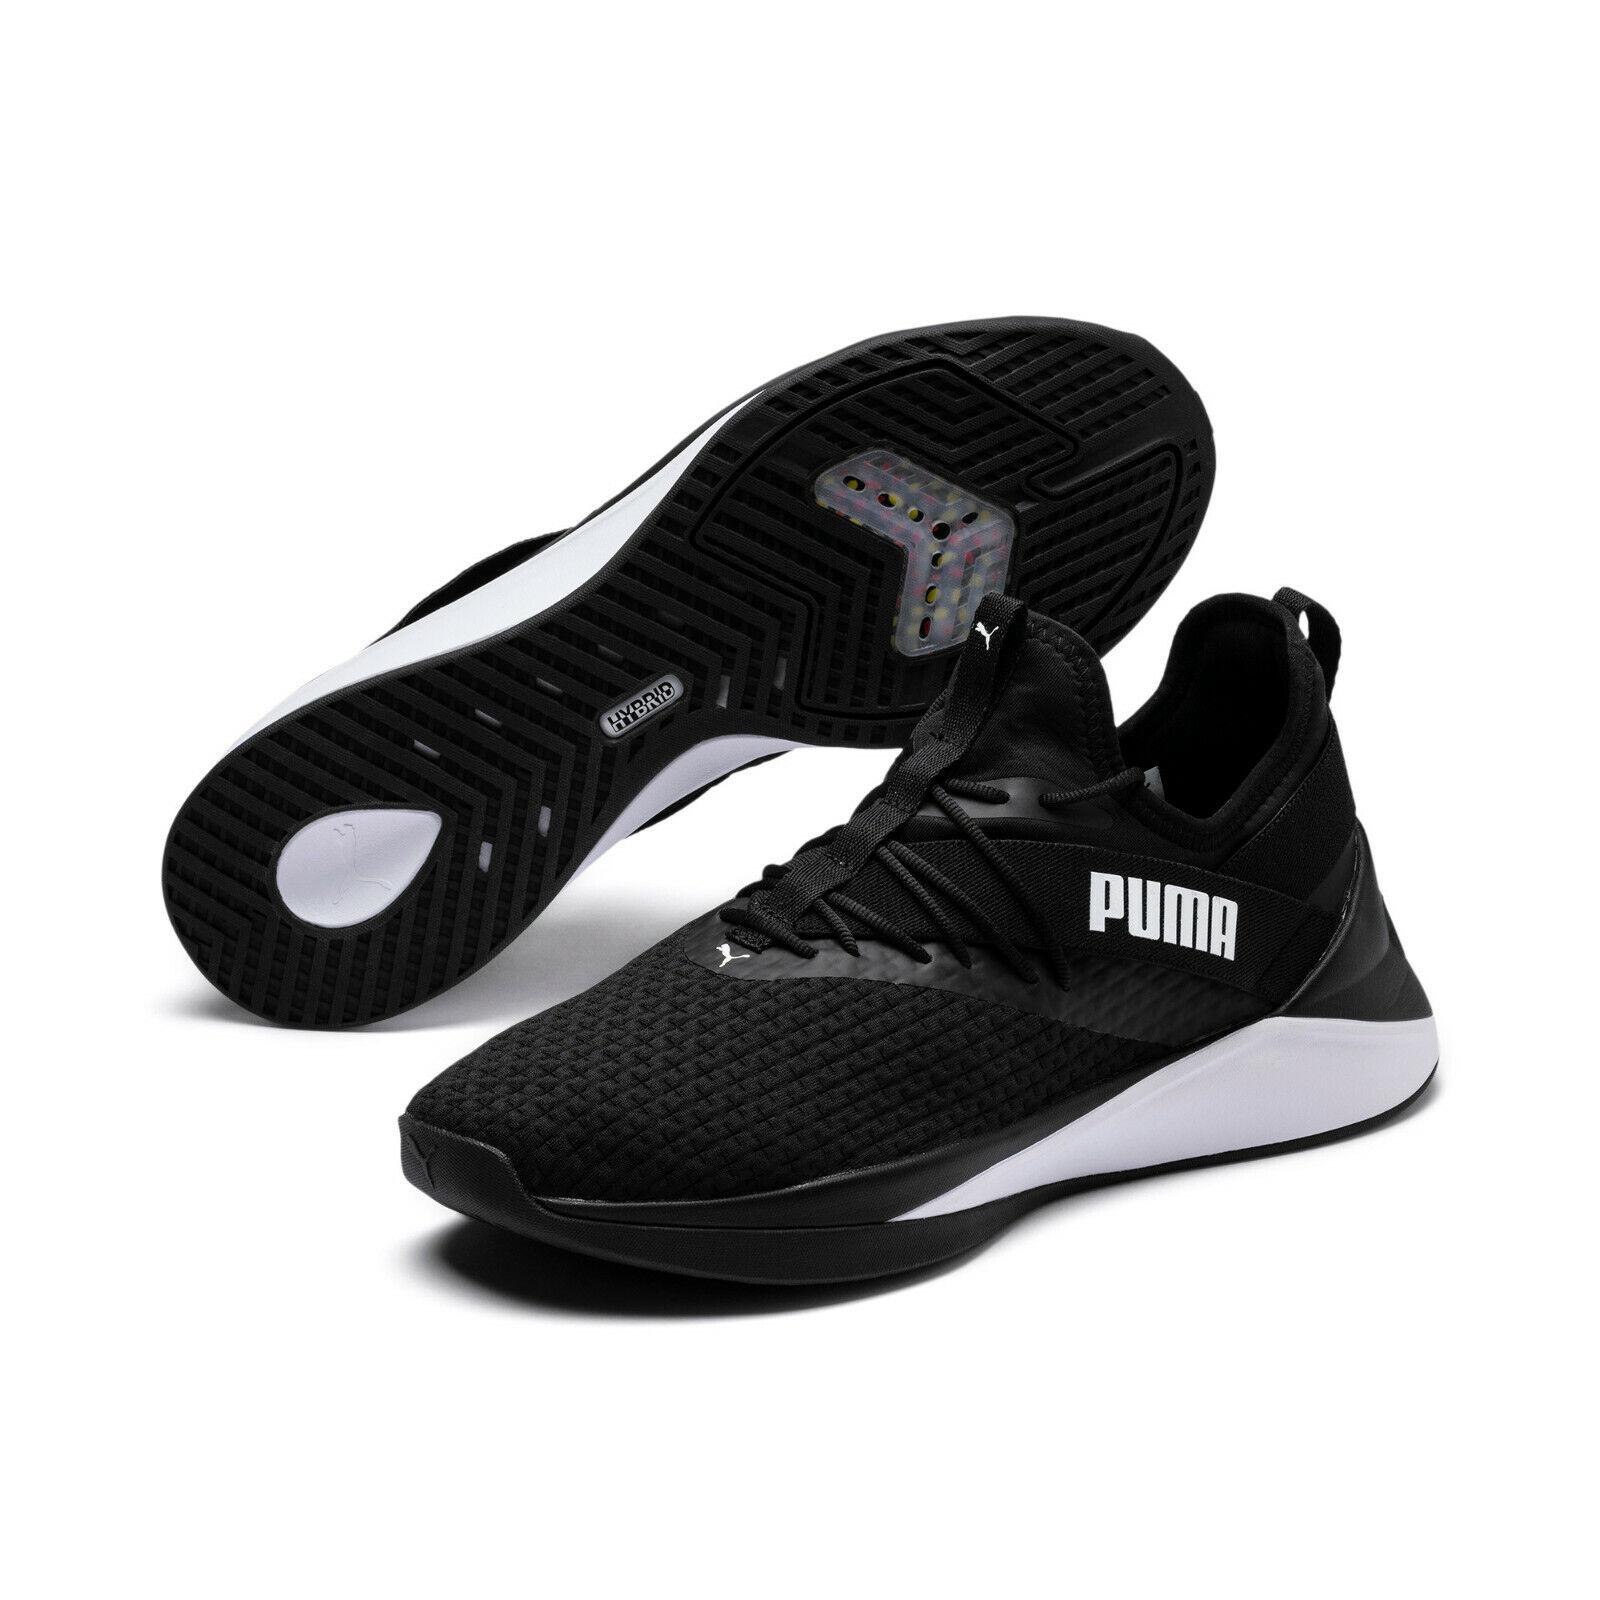 Puma Jaab XT Men's 41-46 caballeros fitness entrenamiento Lifestyle cortos zapato negro